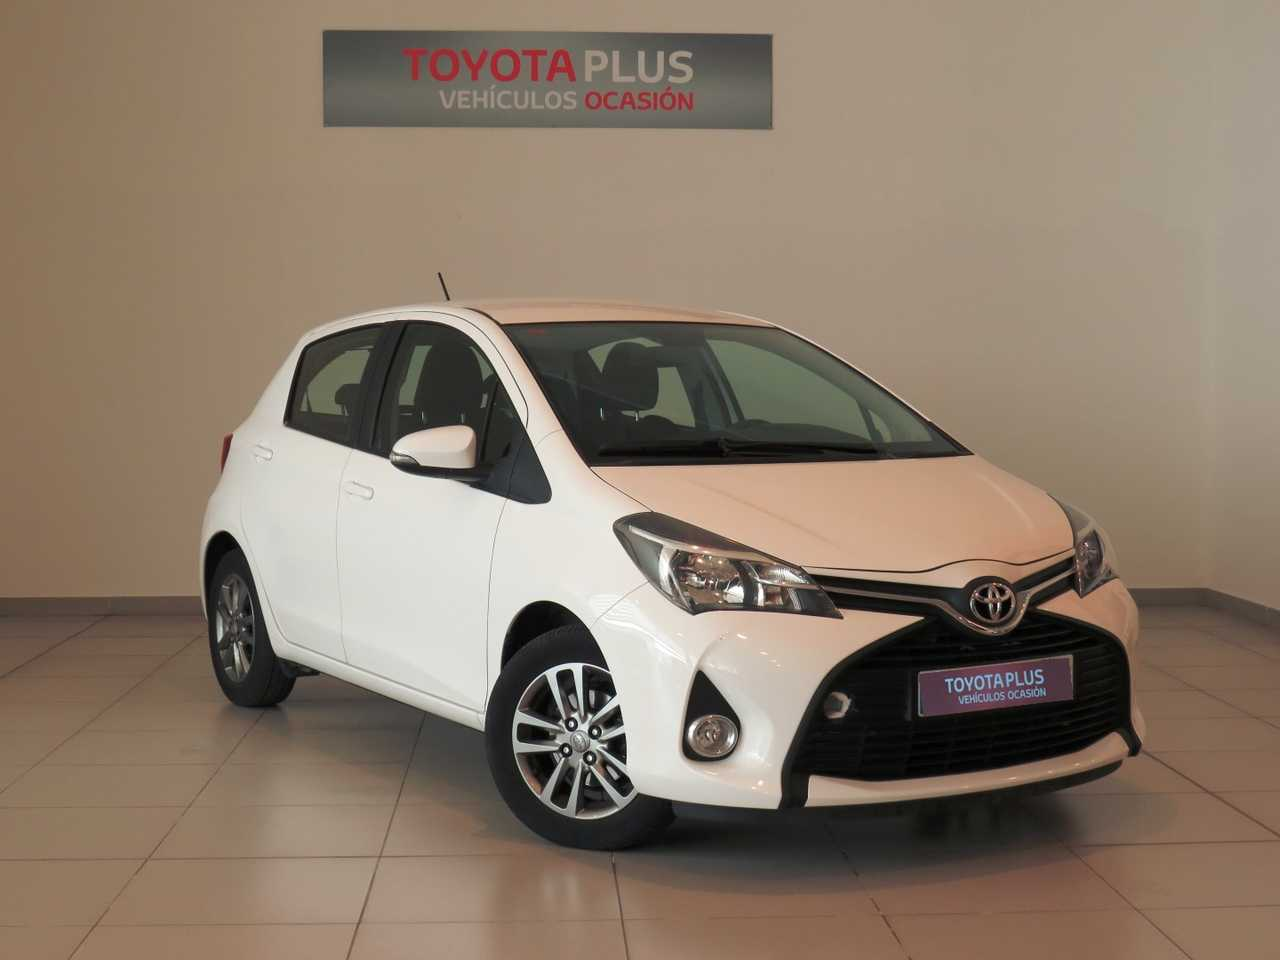 Toyota Yaris 1.0 City 5p   - Foto 1